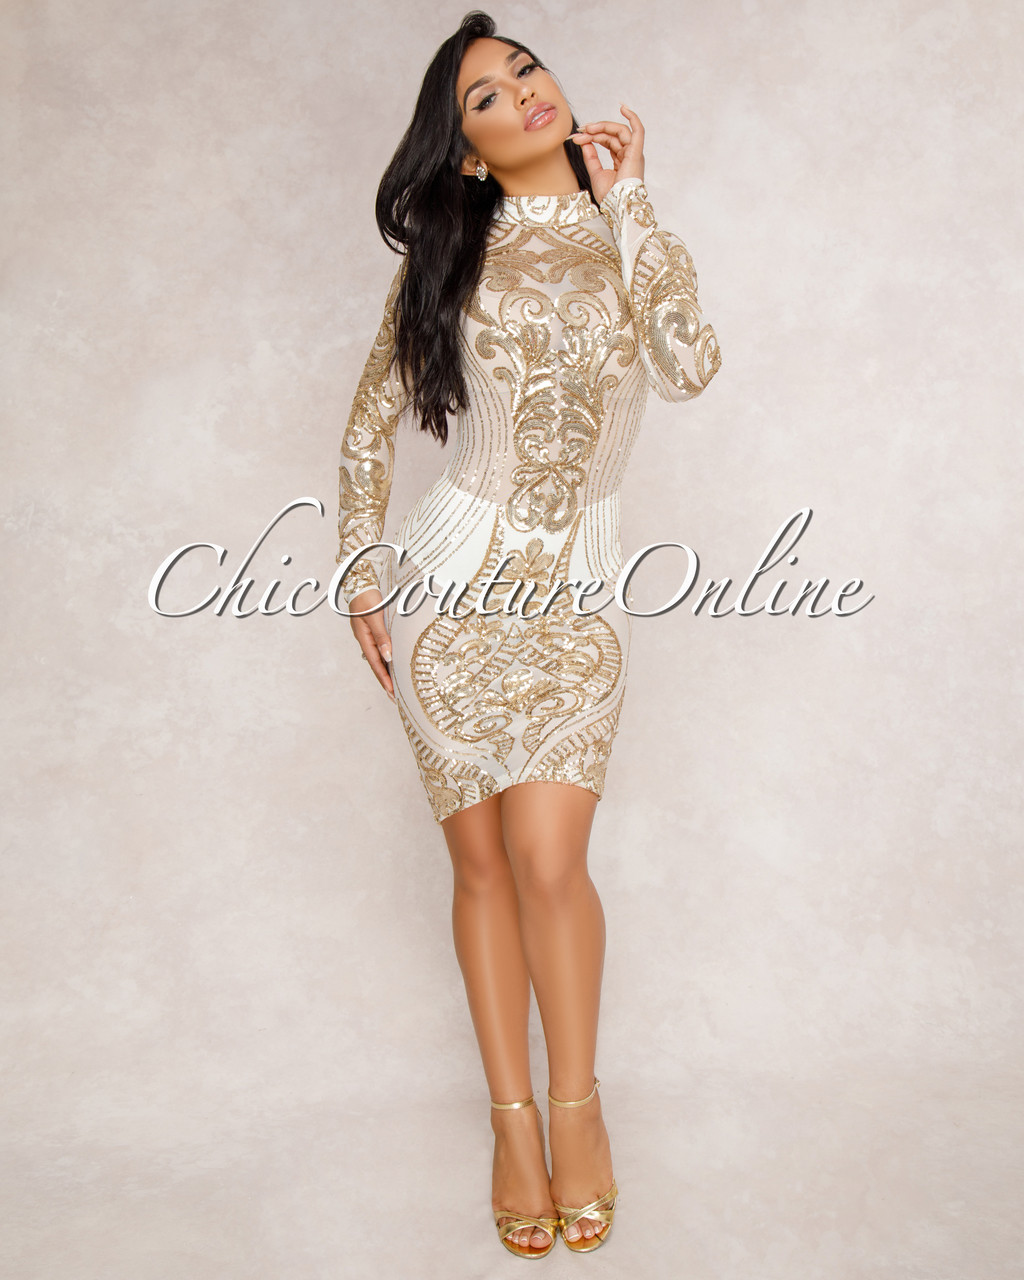 70261ad8aec5 Krystal Gold Sequin Semi-Sheer Dress. Price: $75.00. Image 1